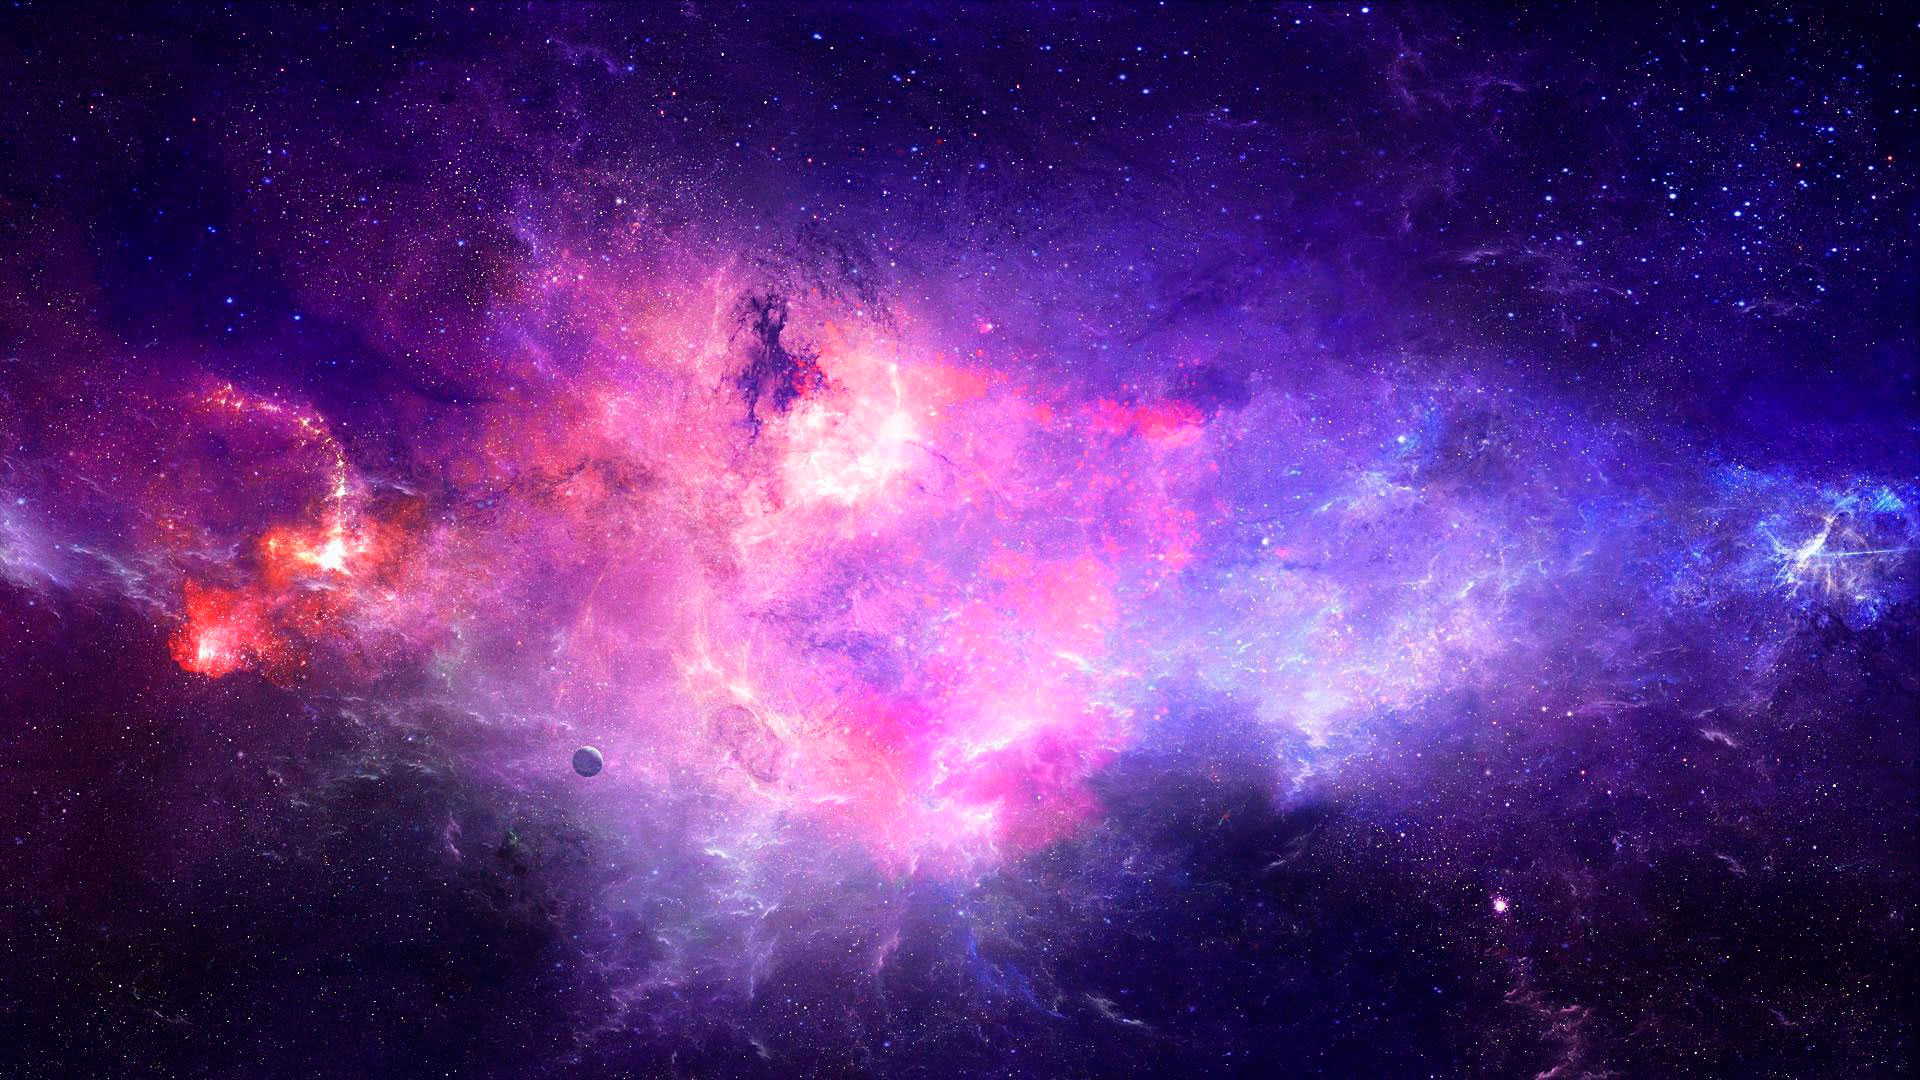 5ehz2cd Galaxy 1080p Wallpapers Purple Galaxy Wallpaper Hd 1920x1080 Download Hd Wallpaper Wallpapertip